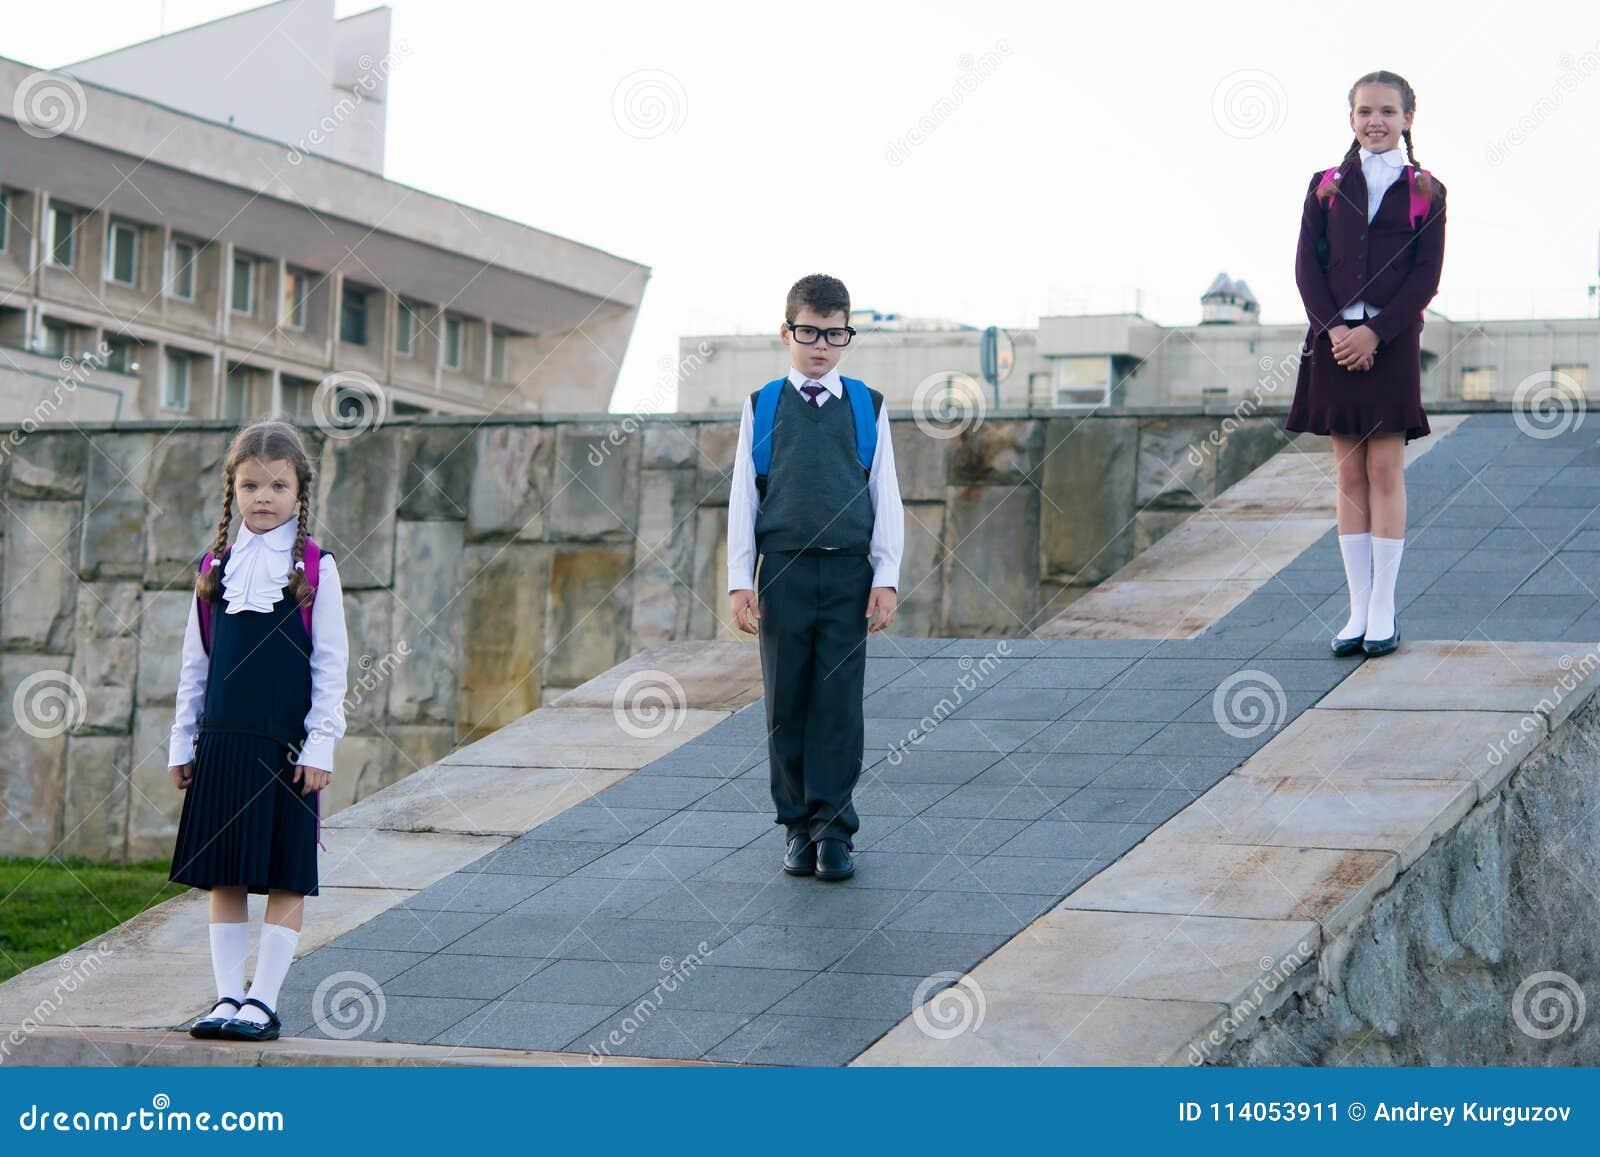 aa84bf8137 Three Schoolchildren Of Different Ages